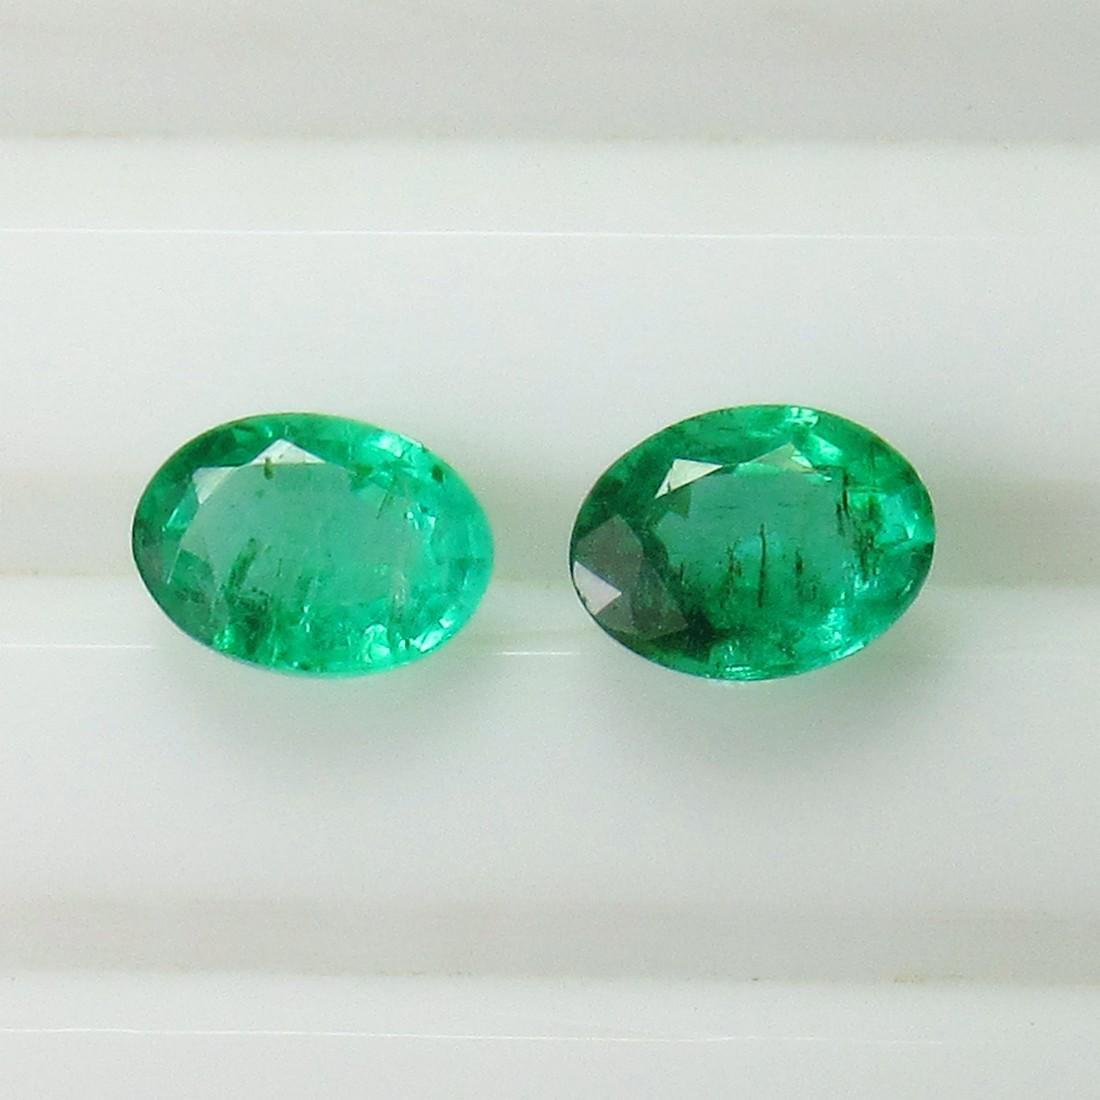 1.02 Ct Genuine Zambian Emerald 6X4.5 mm Oval Pair - 2